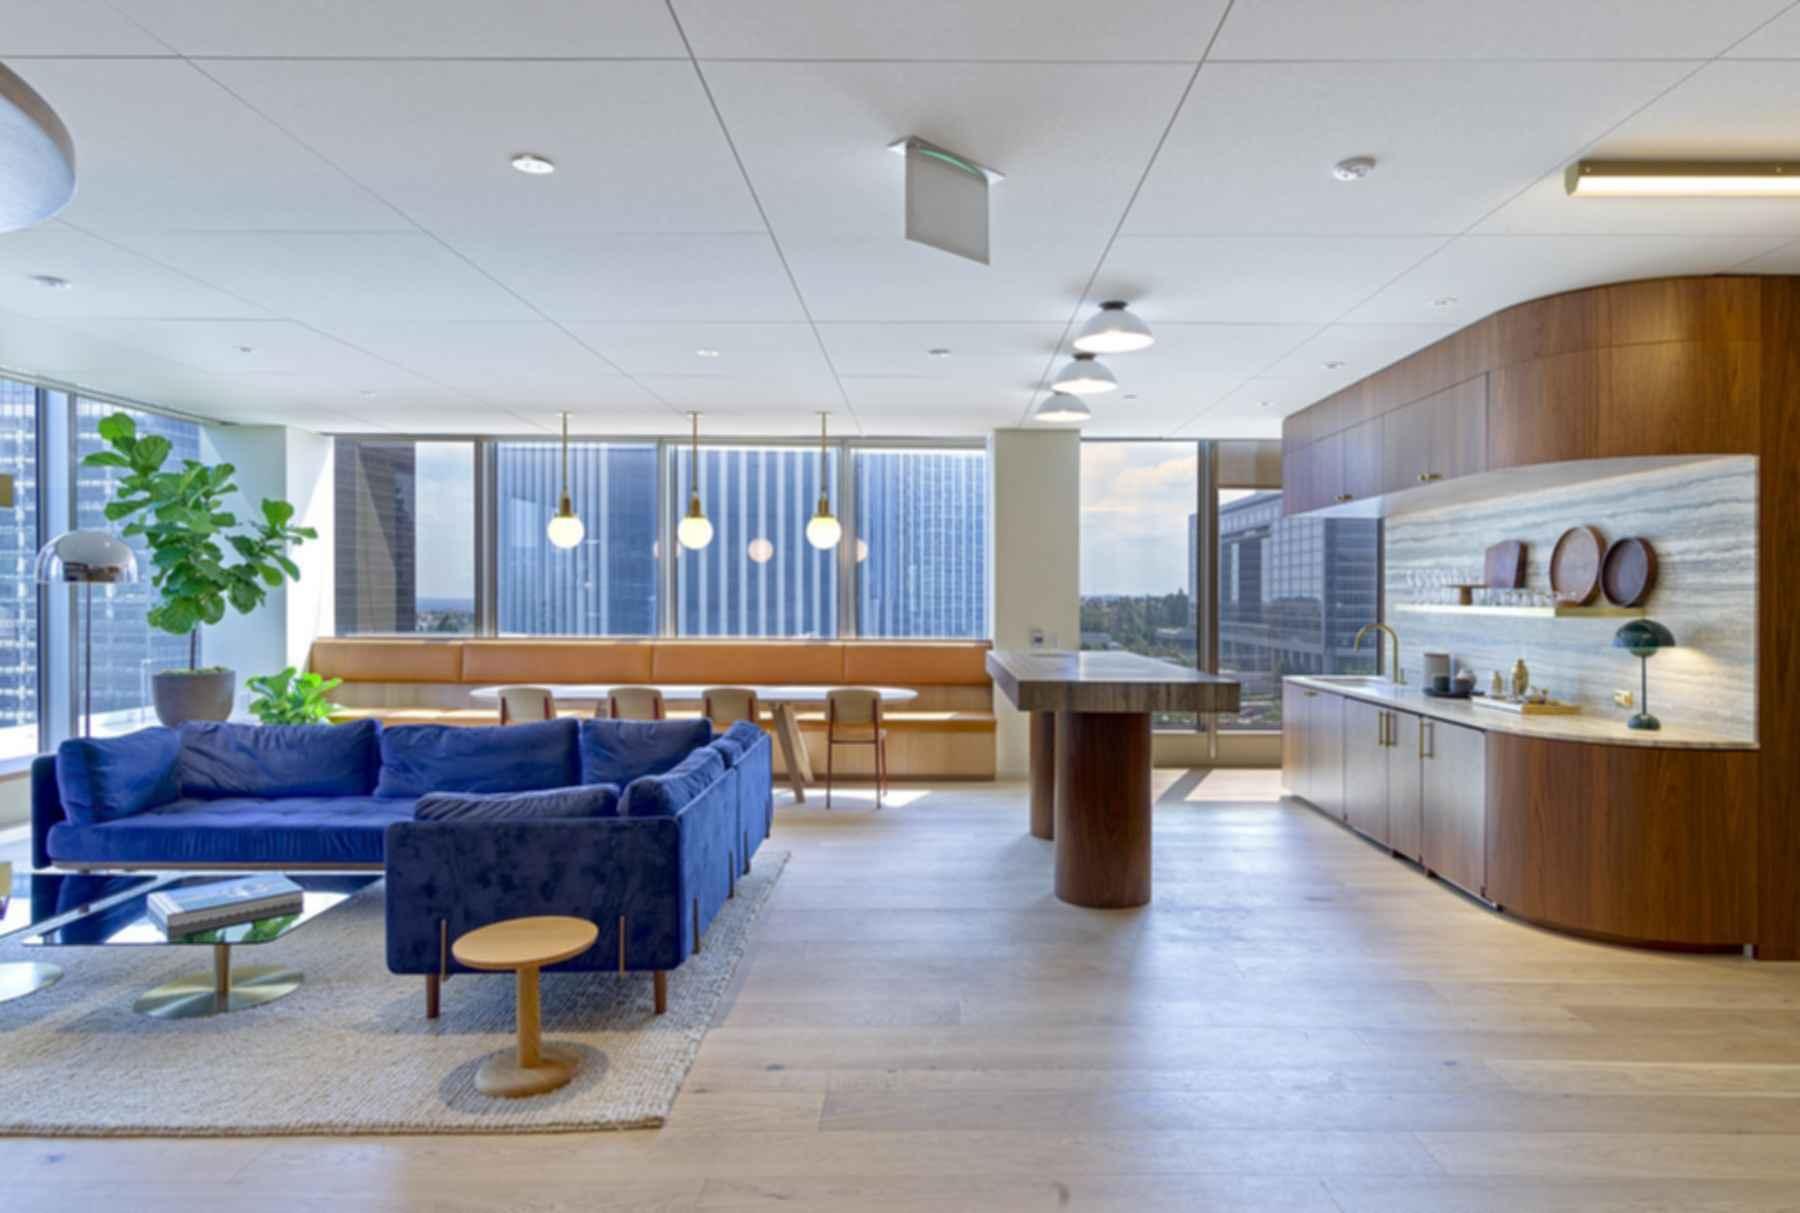 SOWD Office - Break Room